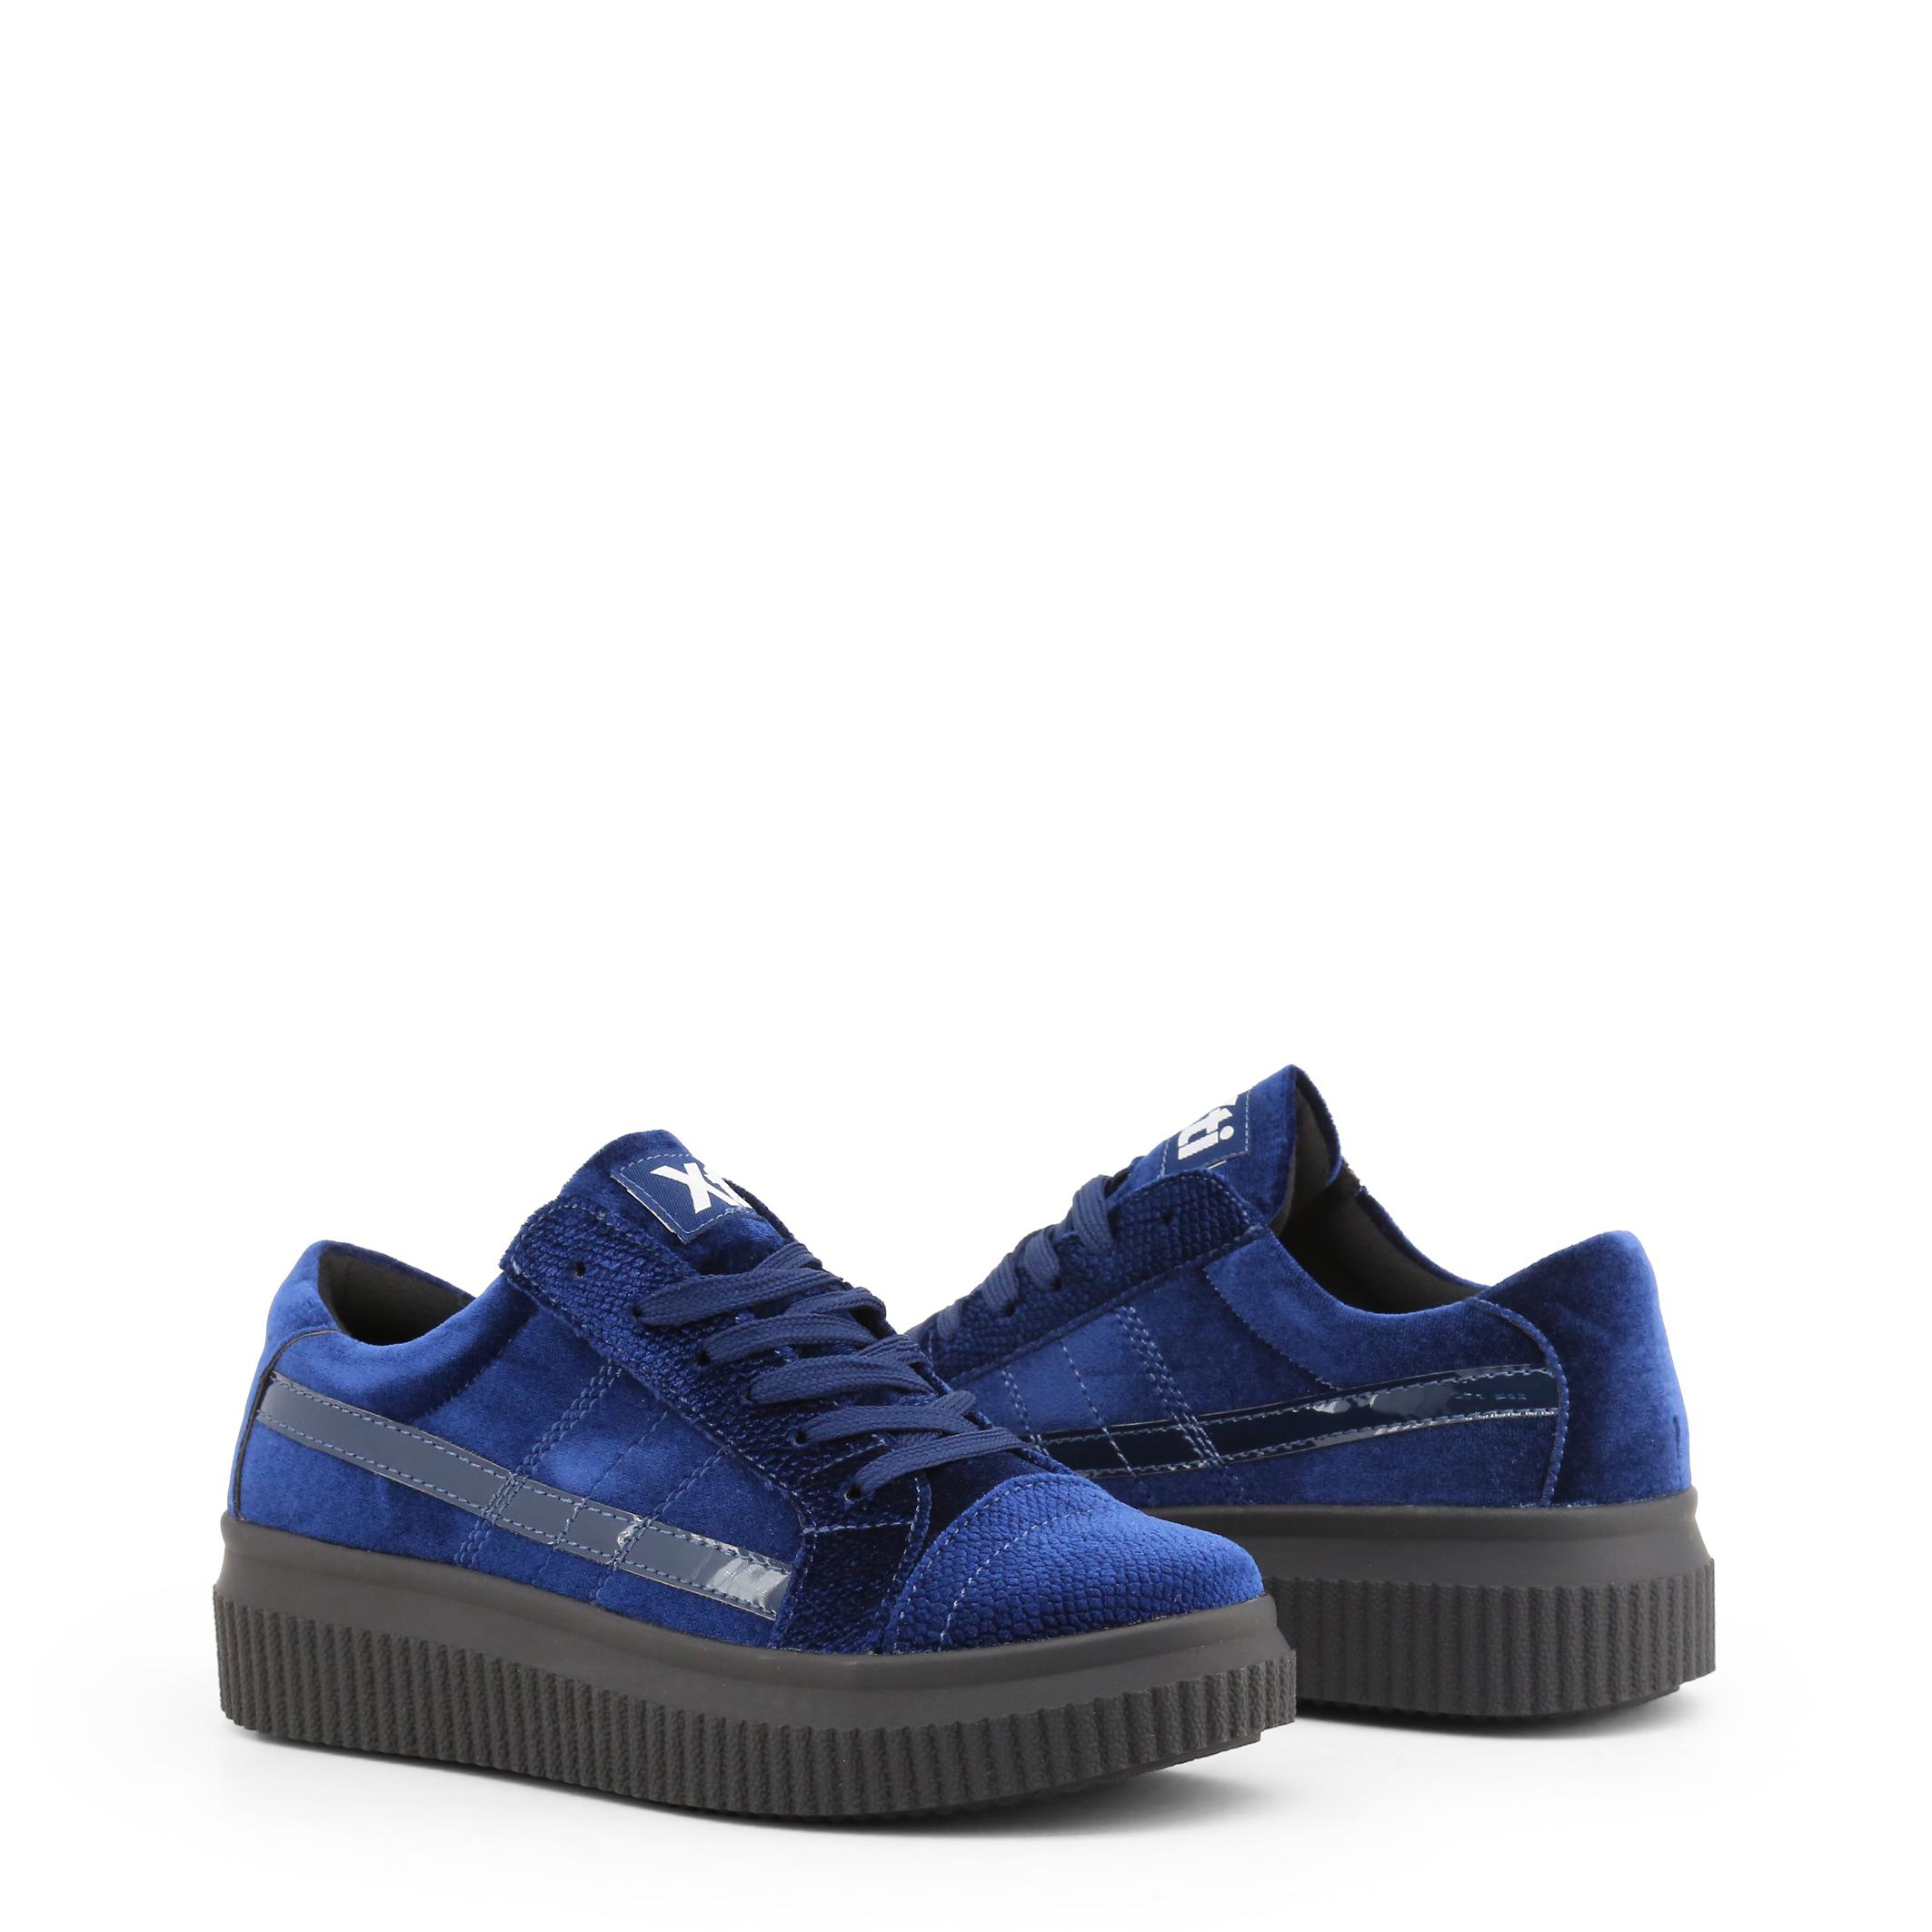 Xti Schuhe turnschuhe 47537, Damen Sneakers Blau/Grau/Violett/Schwarz turnschuhe Schuhe freizeit a523bc